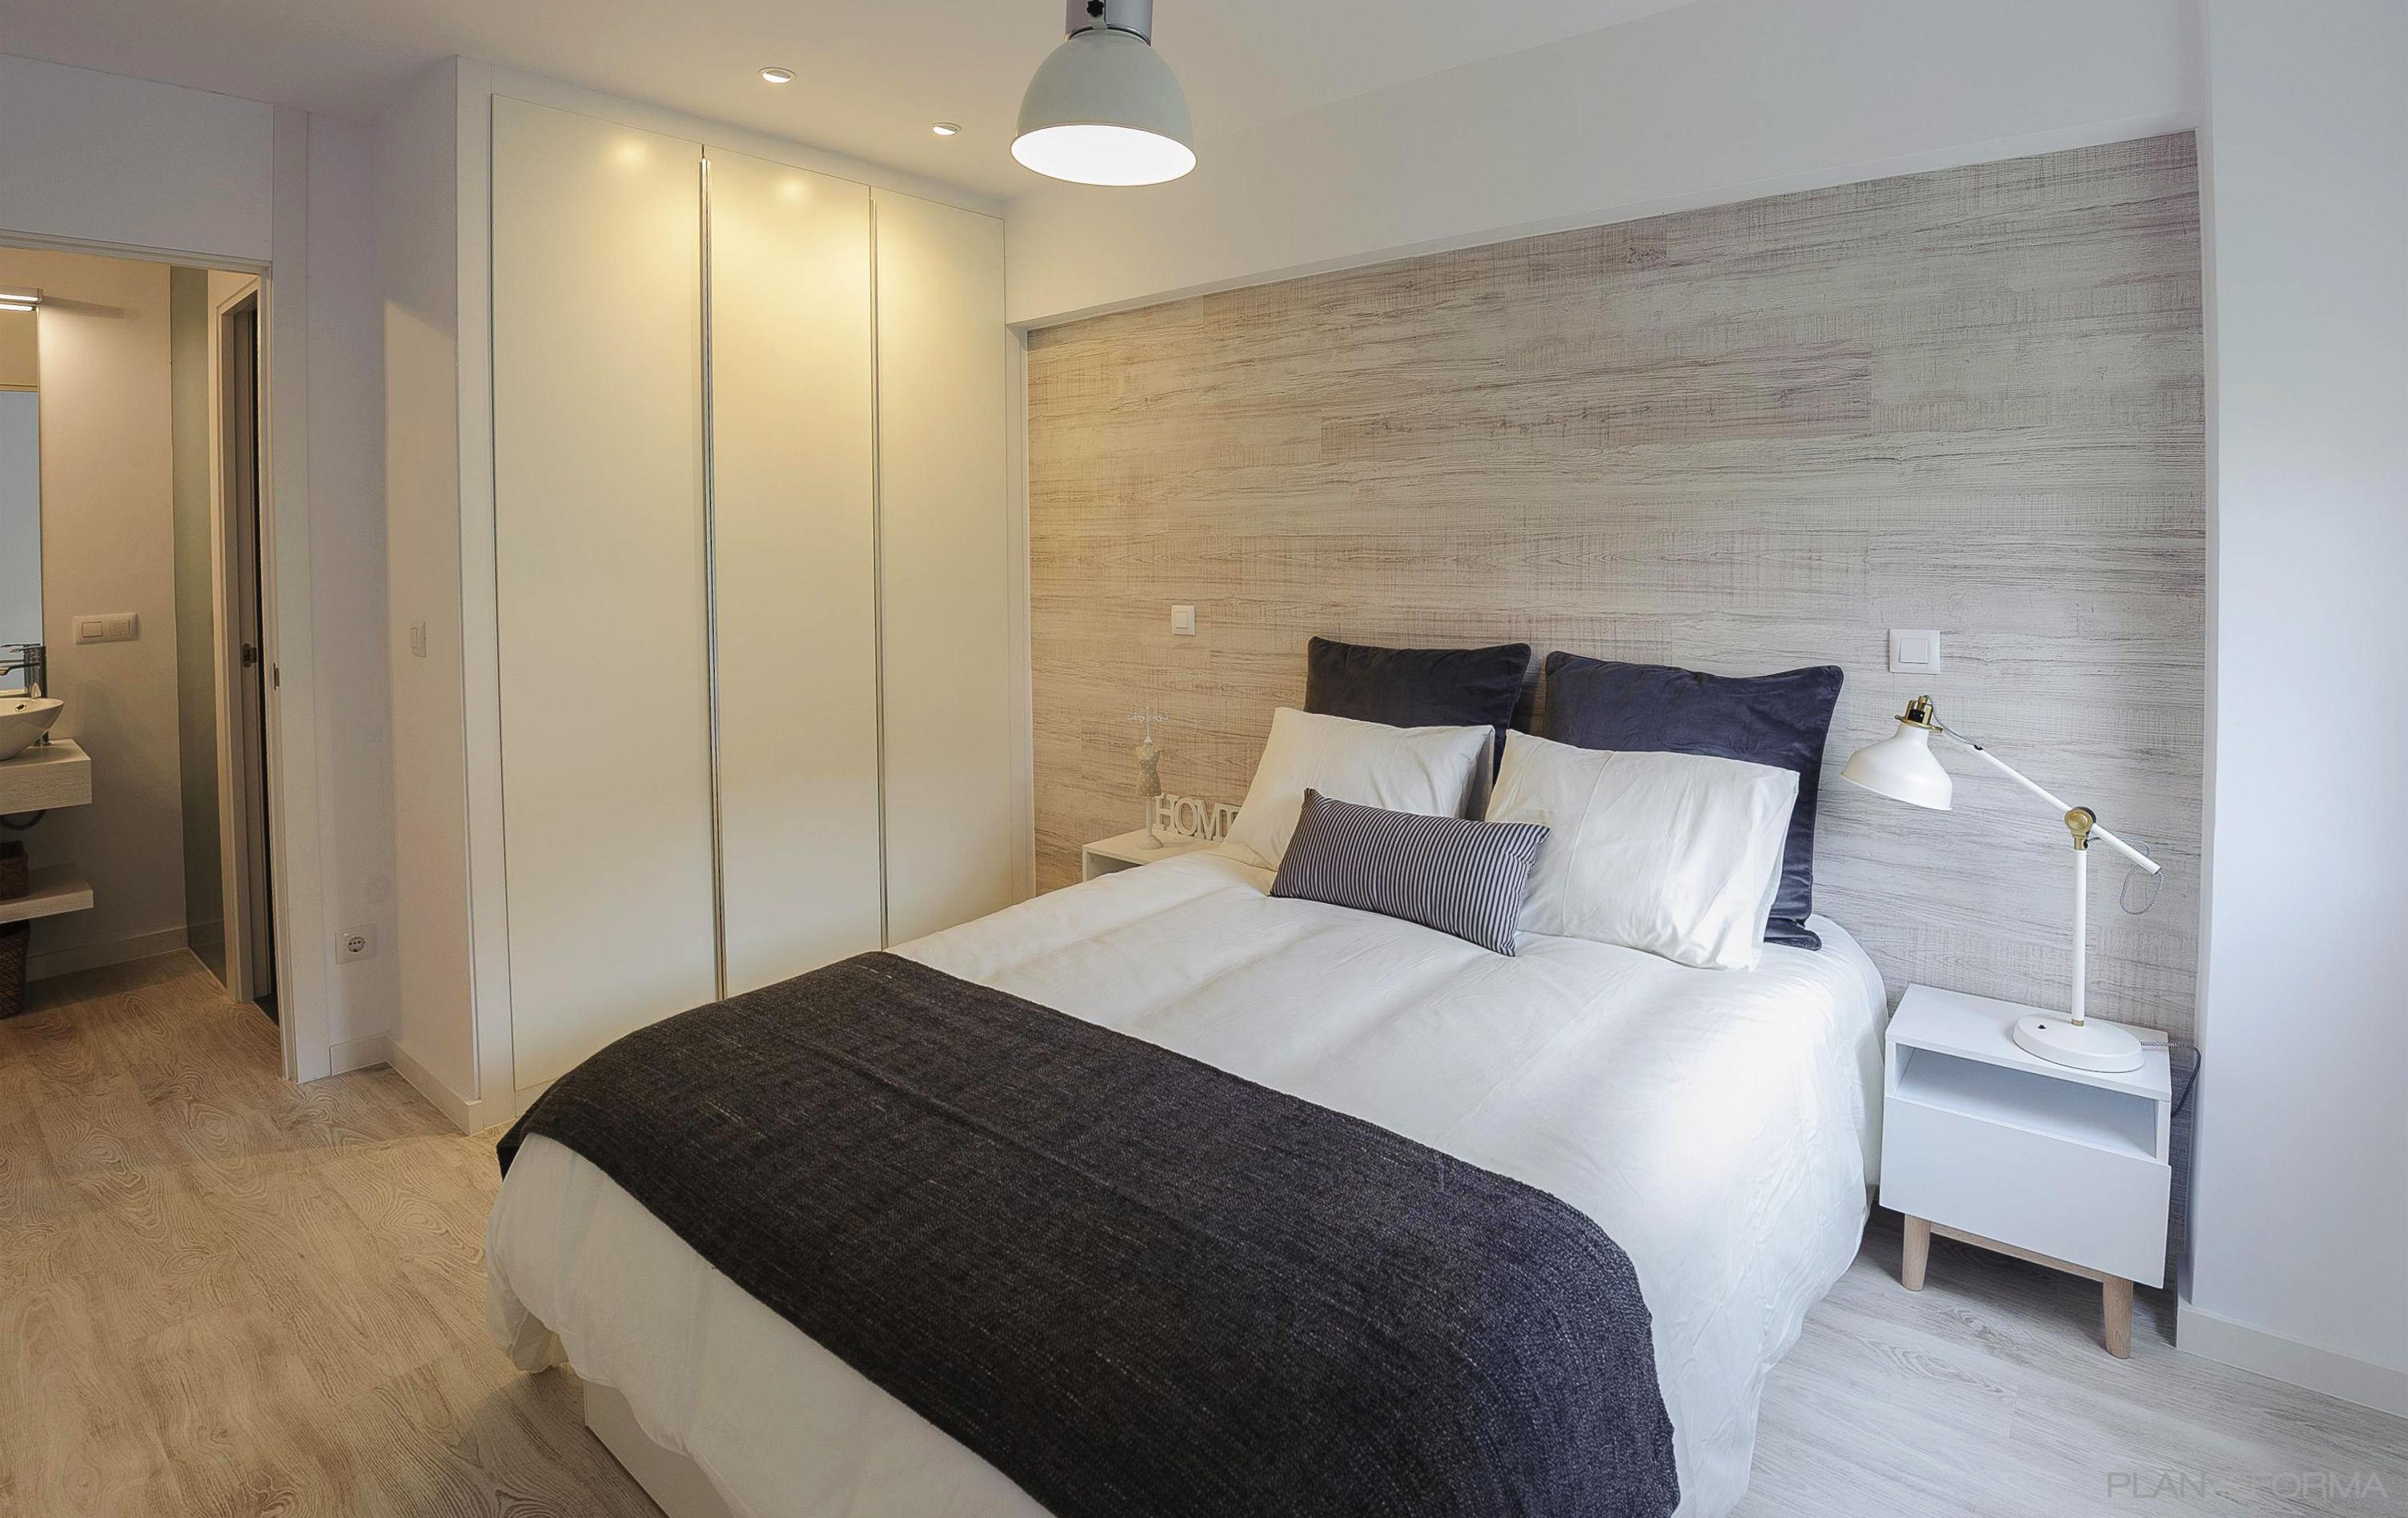 Ba o dormitorio pasillo estilo tradicional color beige for Dormitorio gris